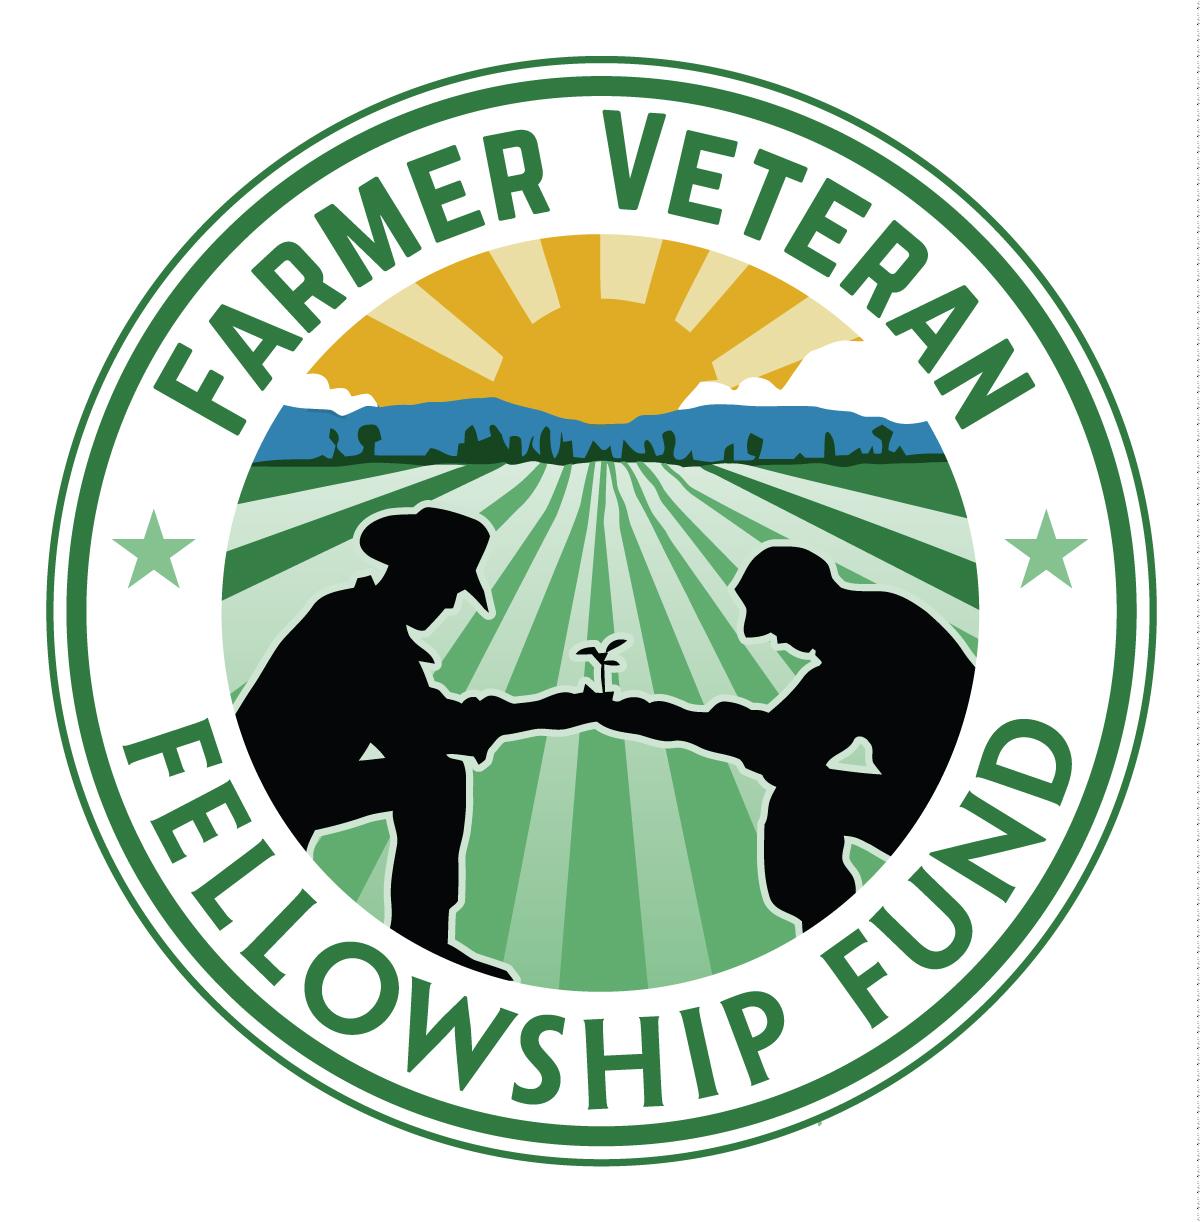 Farmer Veteran Fellowship Fund to Begin Accepting Applications February 1